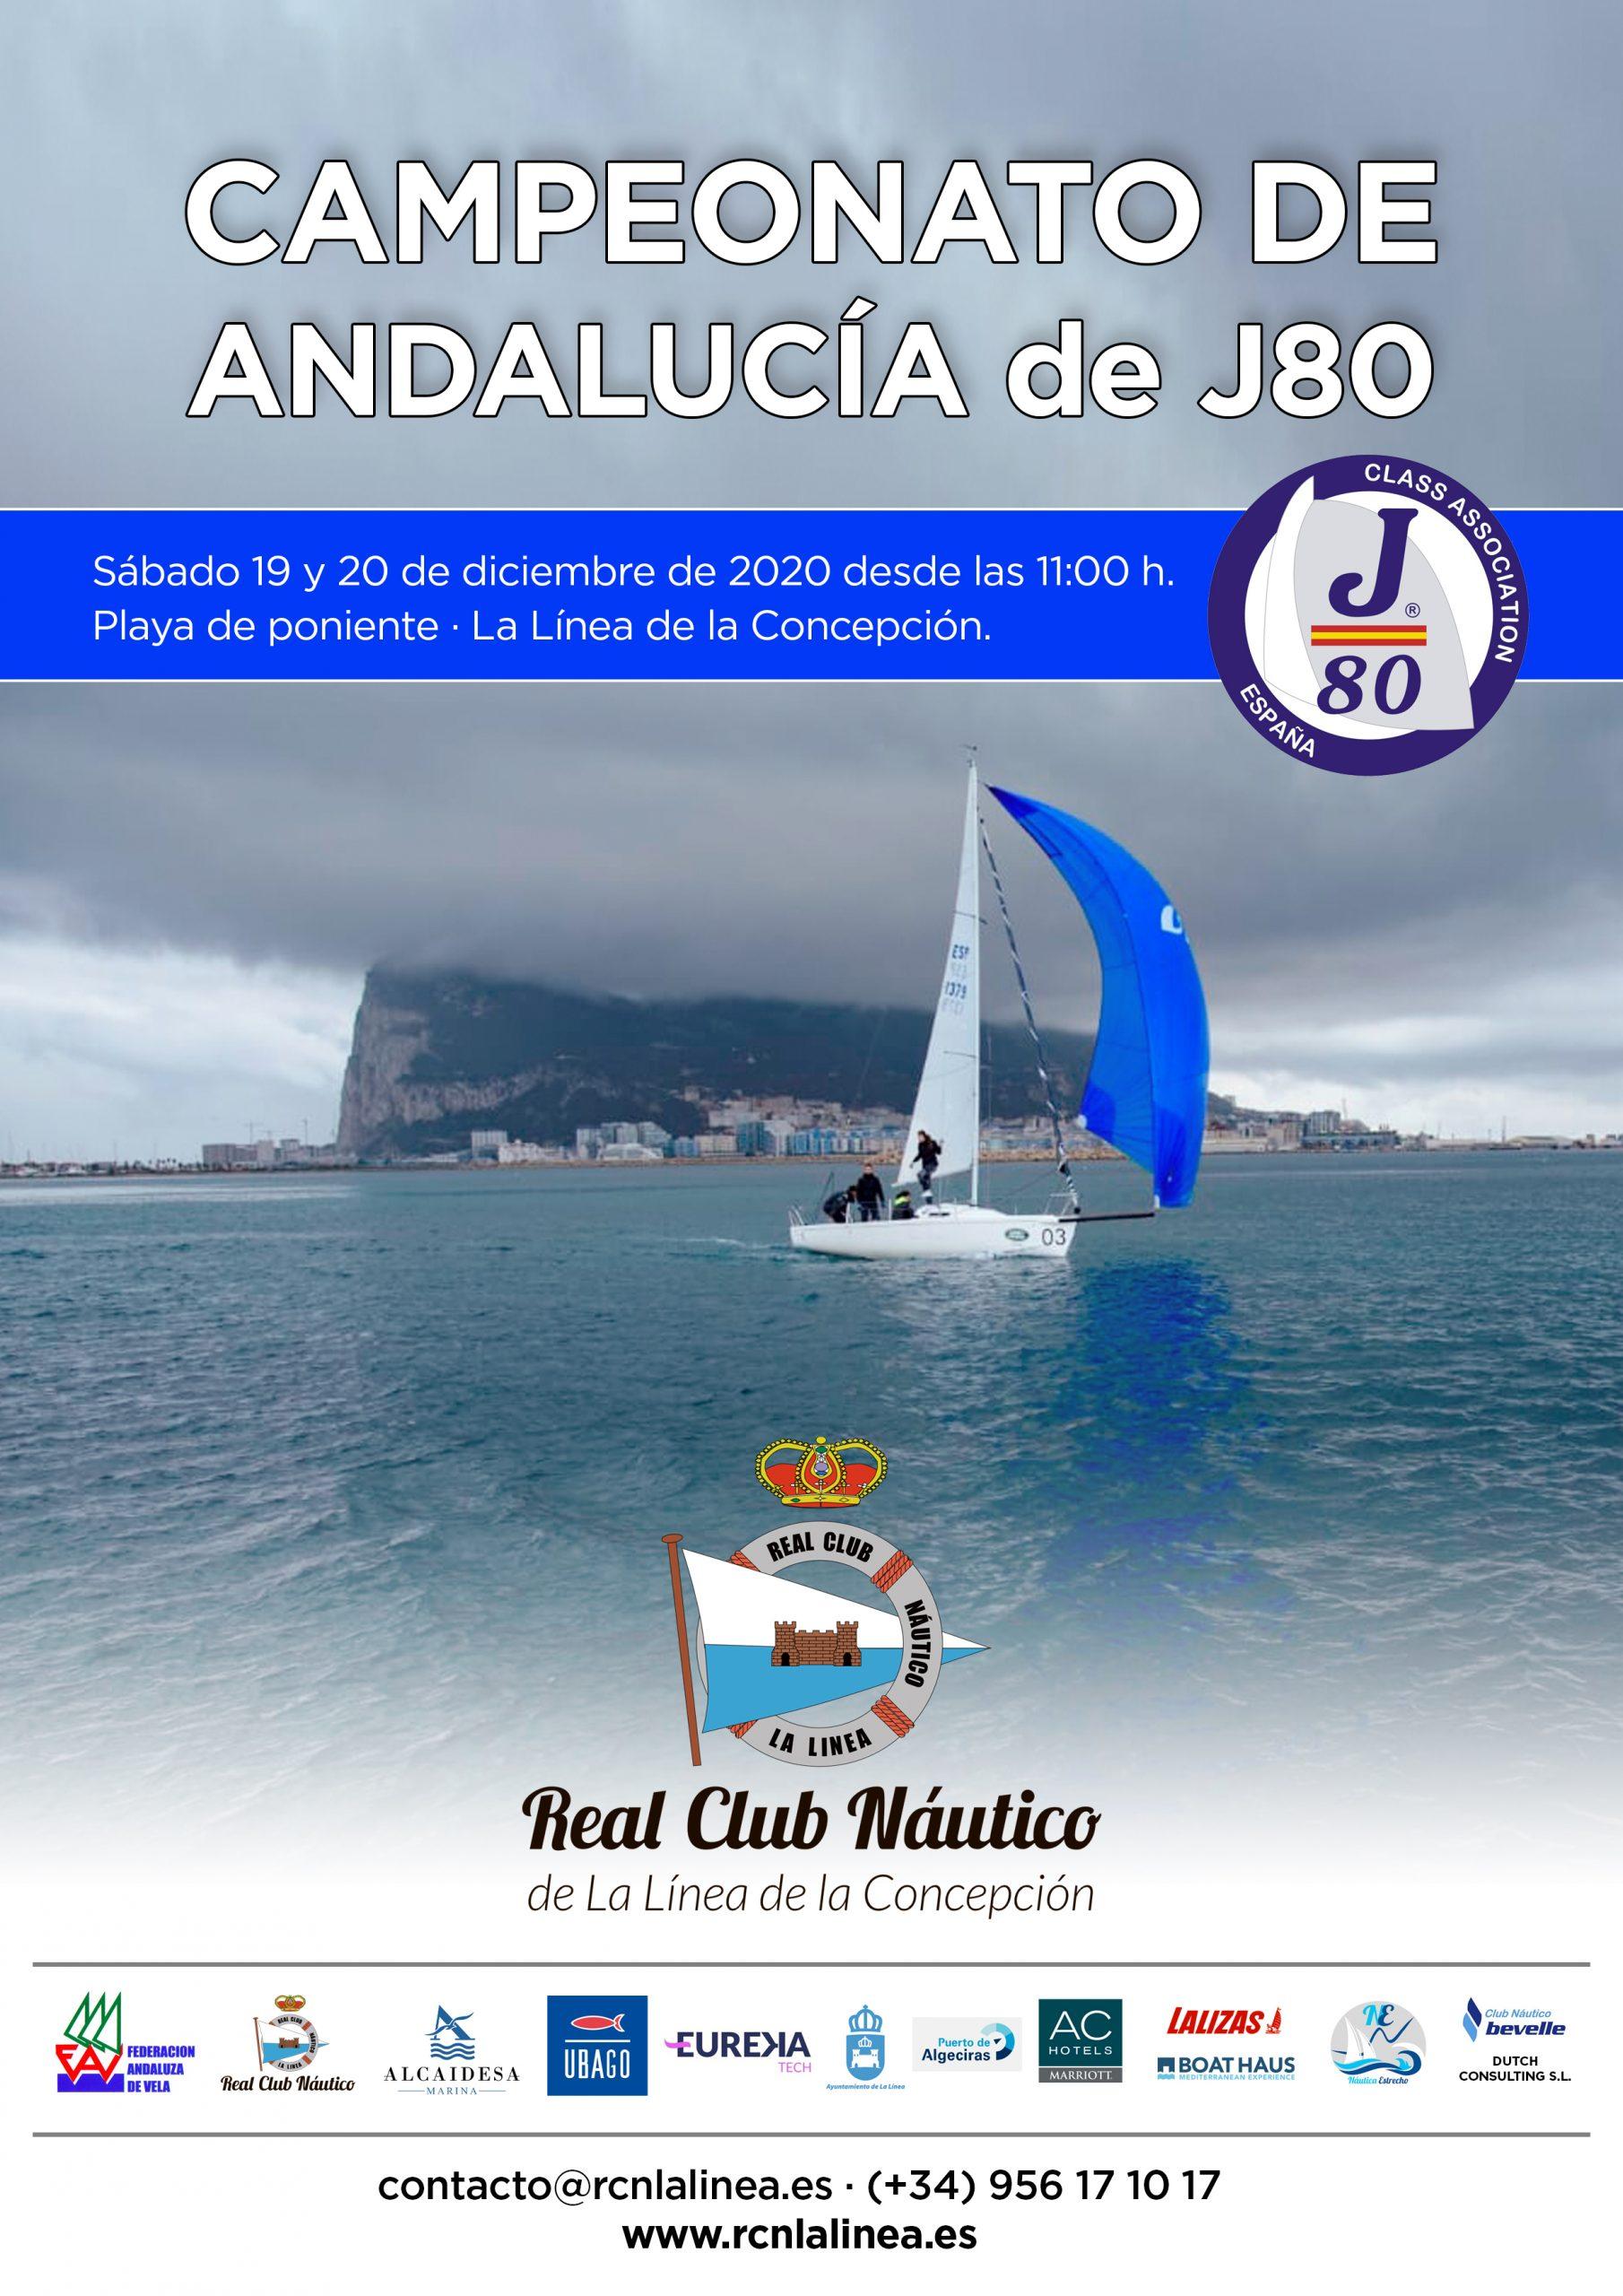 Campeonato De Andalucía De J/80